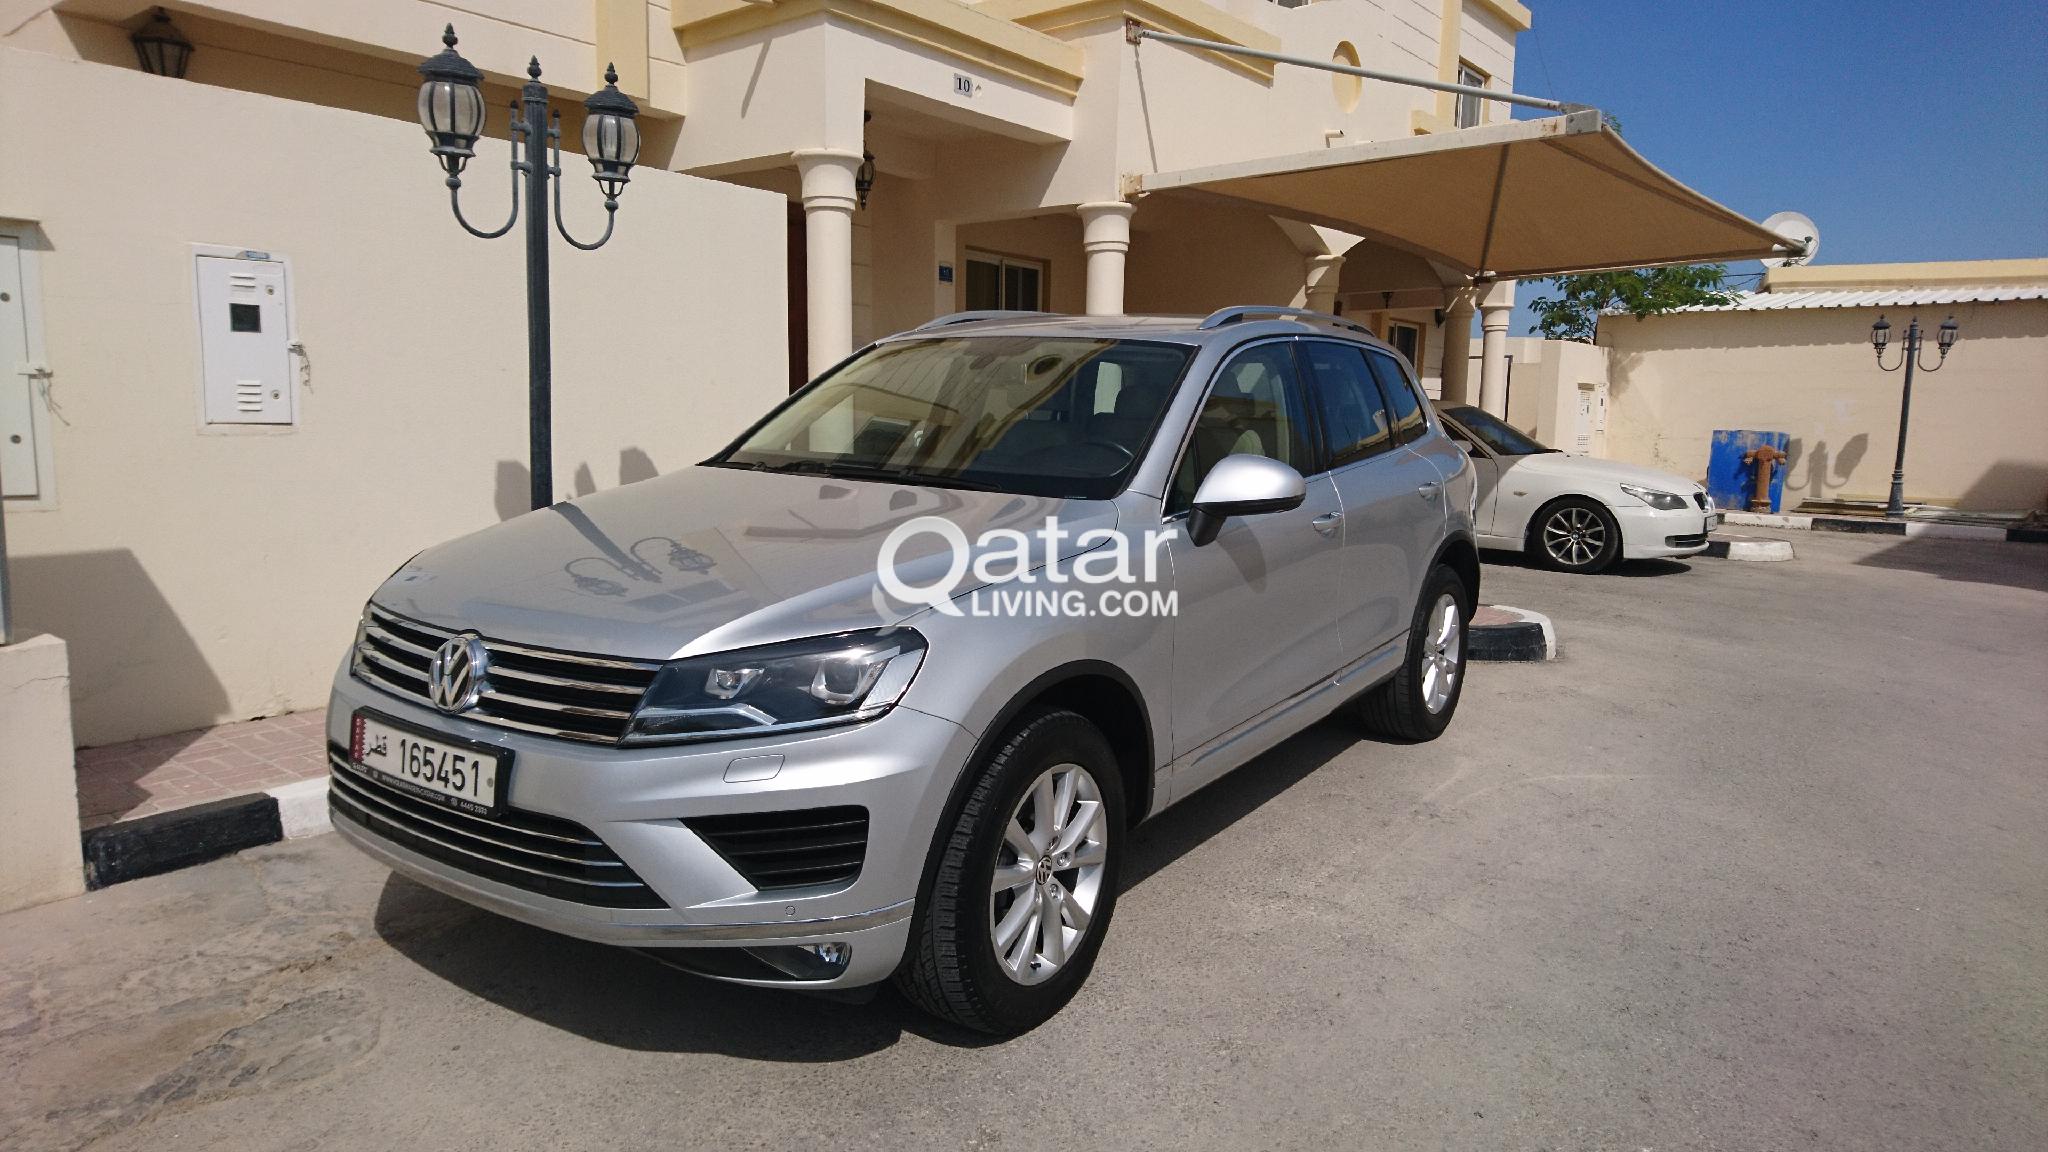 2015 VW TOUAREG under warranty